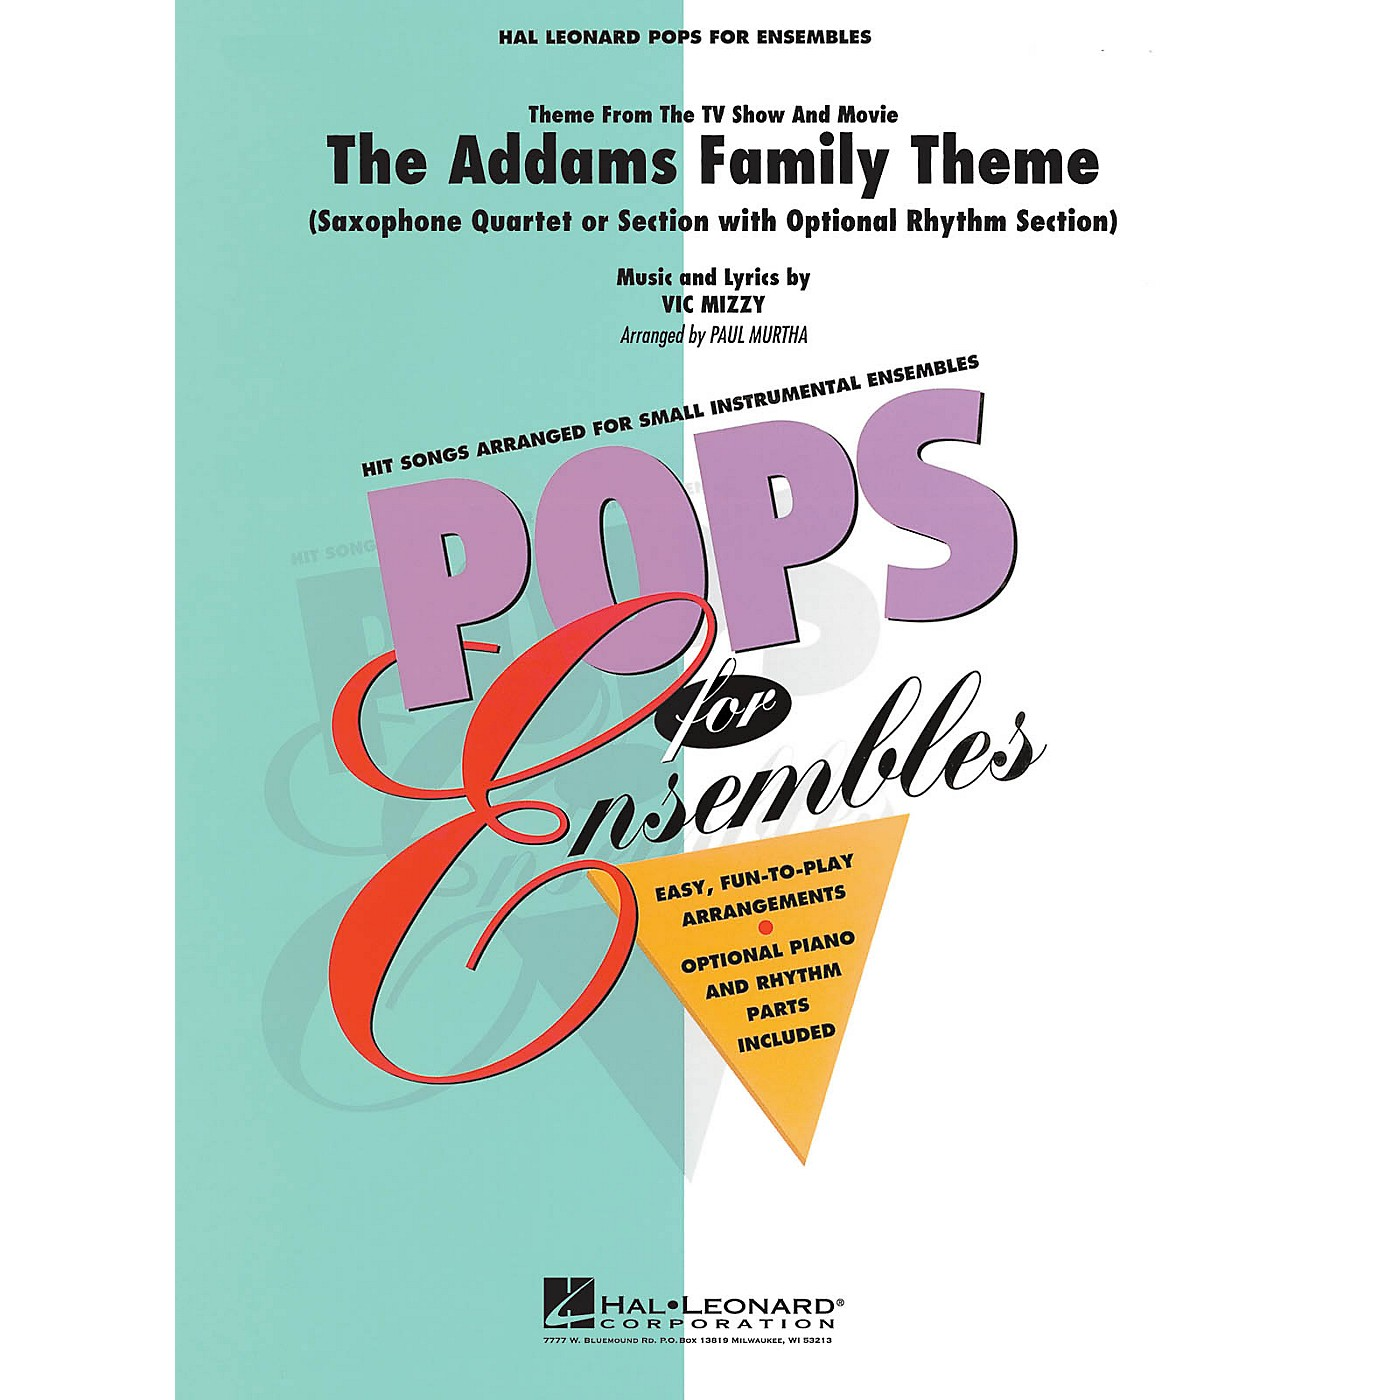 Hal Leonard The Addams Family Theme Concert Band Level 2-3 Arranged by Paul Murtha thumbnail